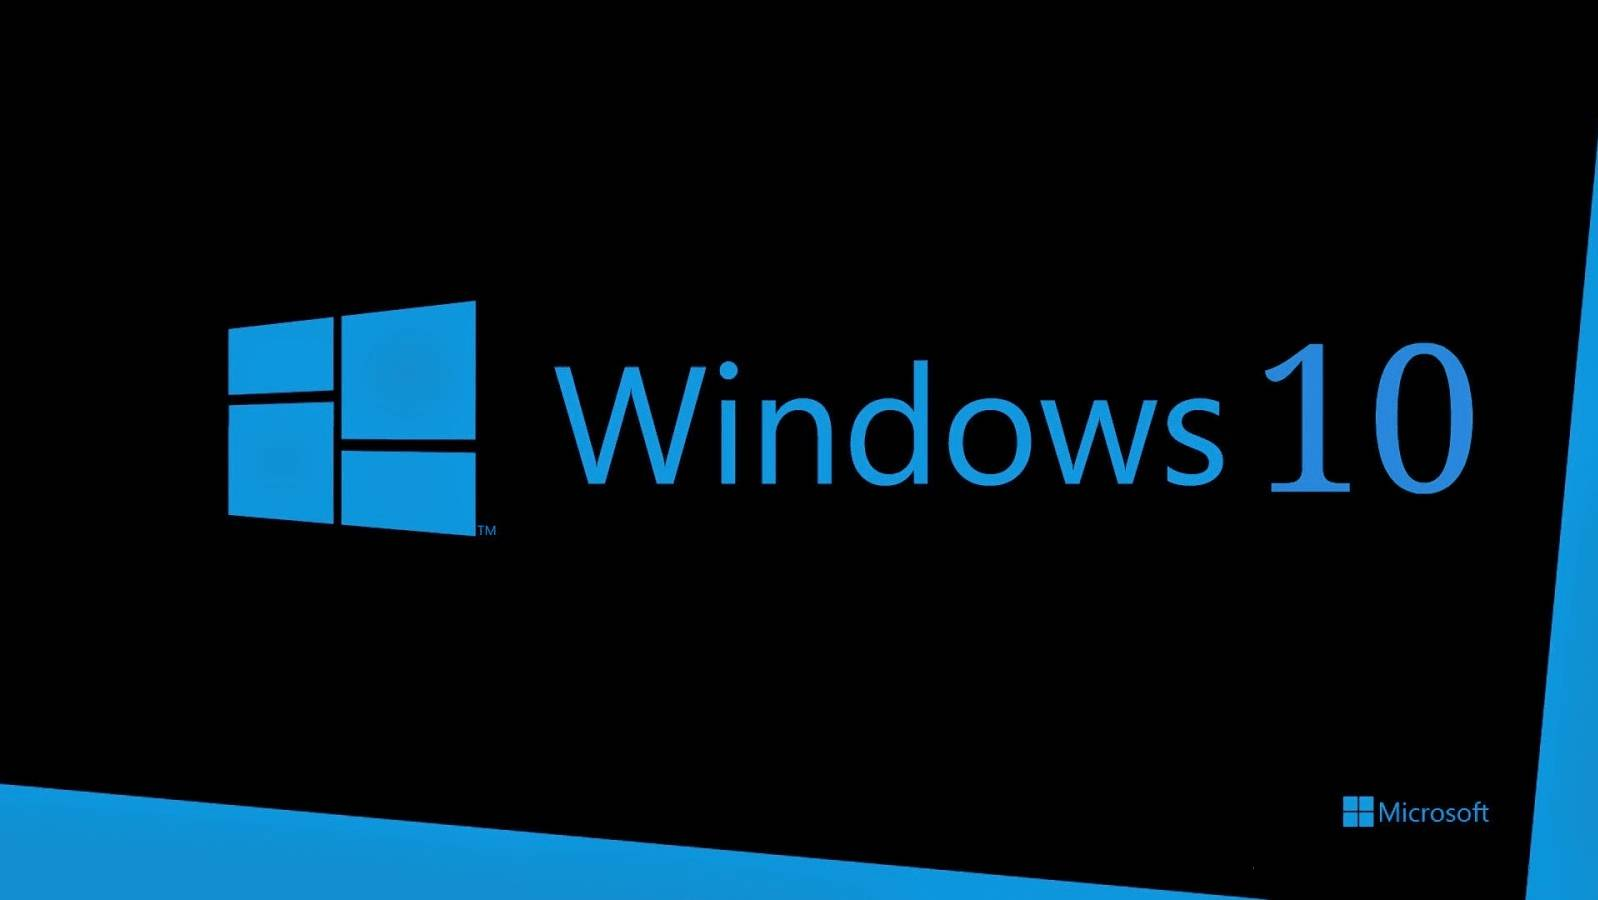 windows 10 zero-day